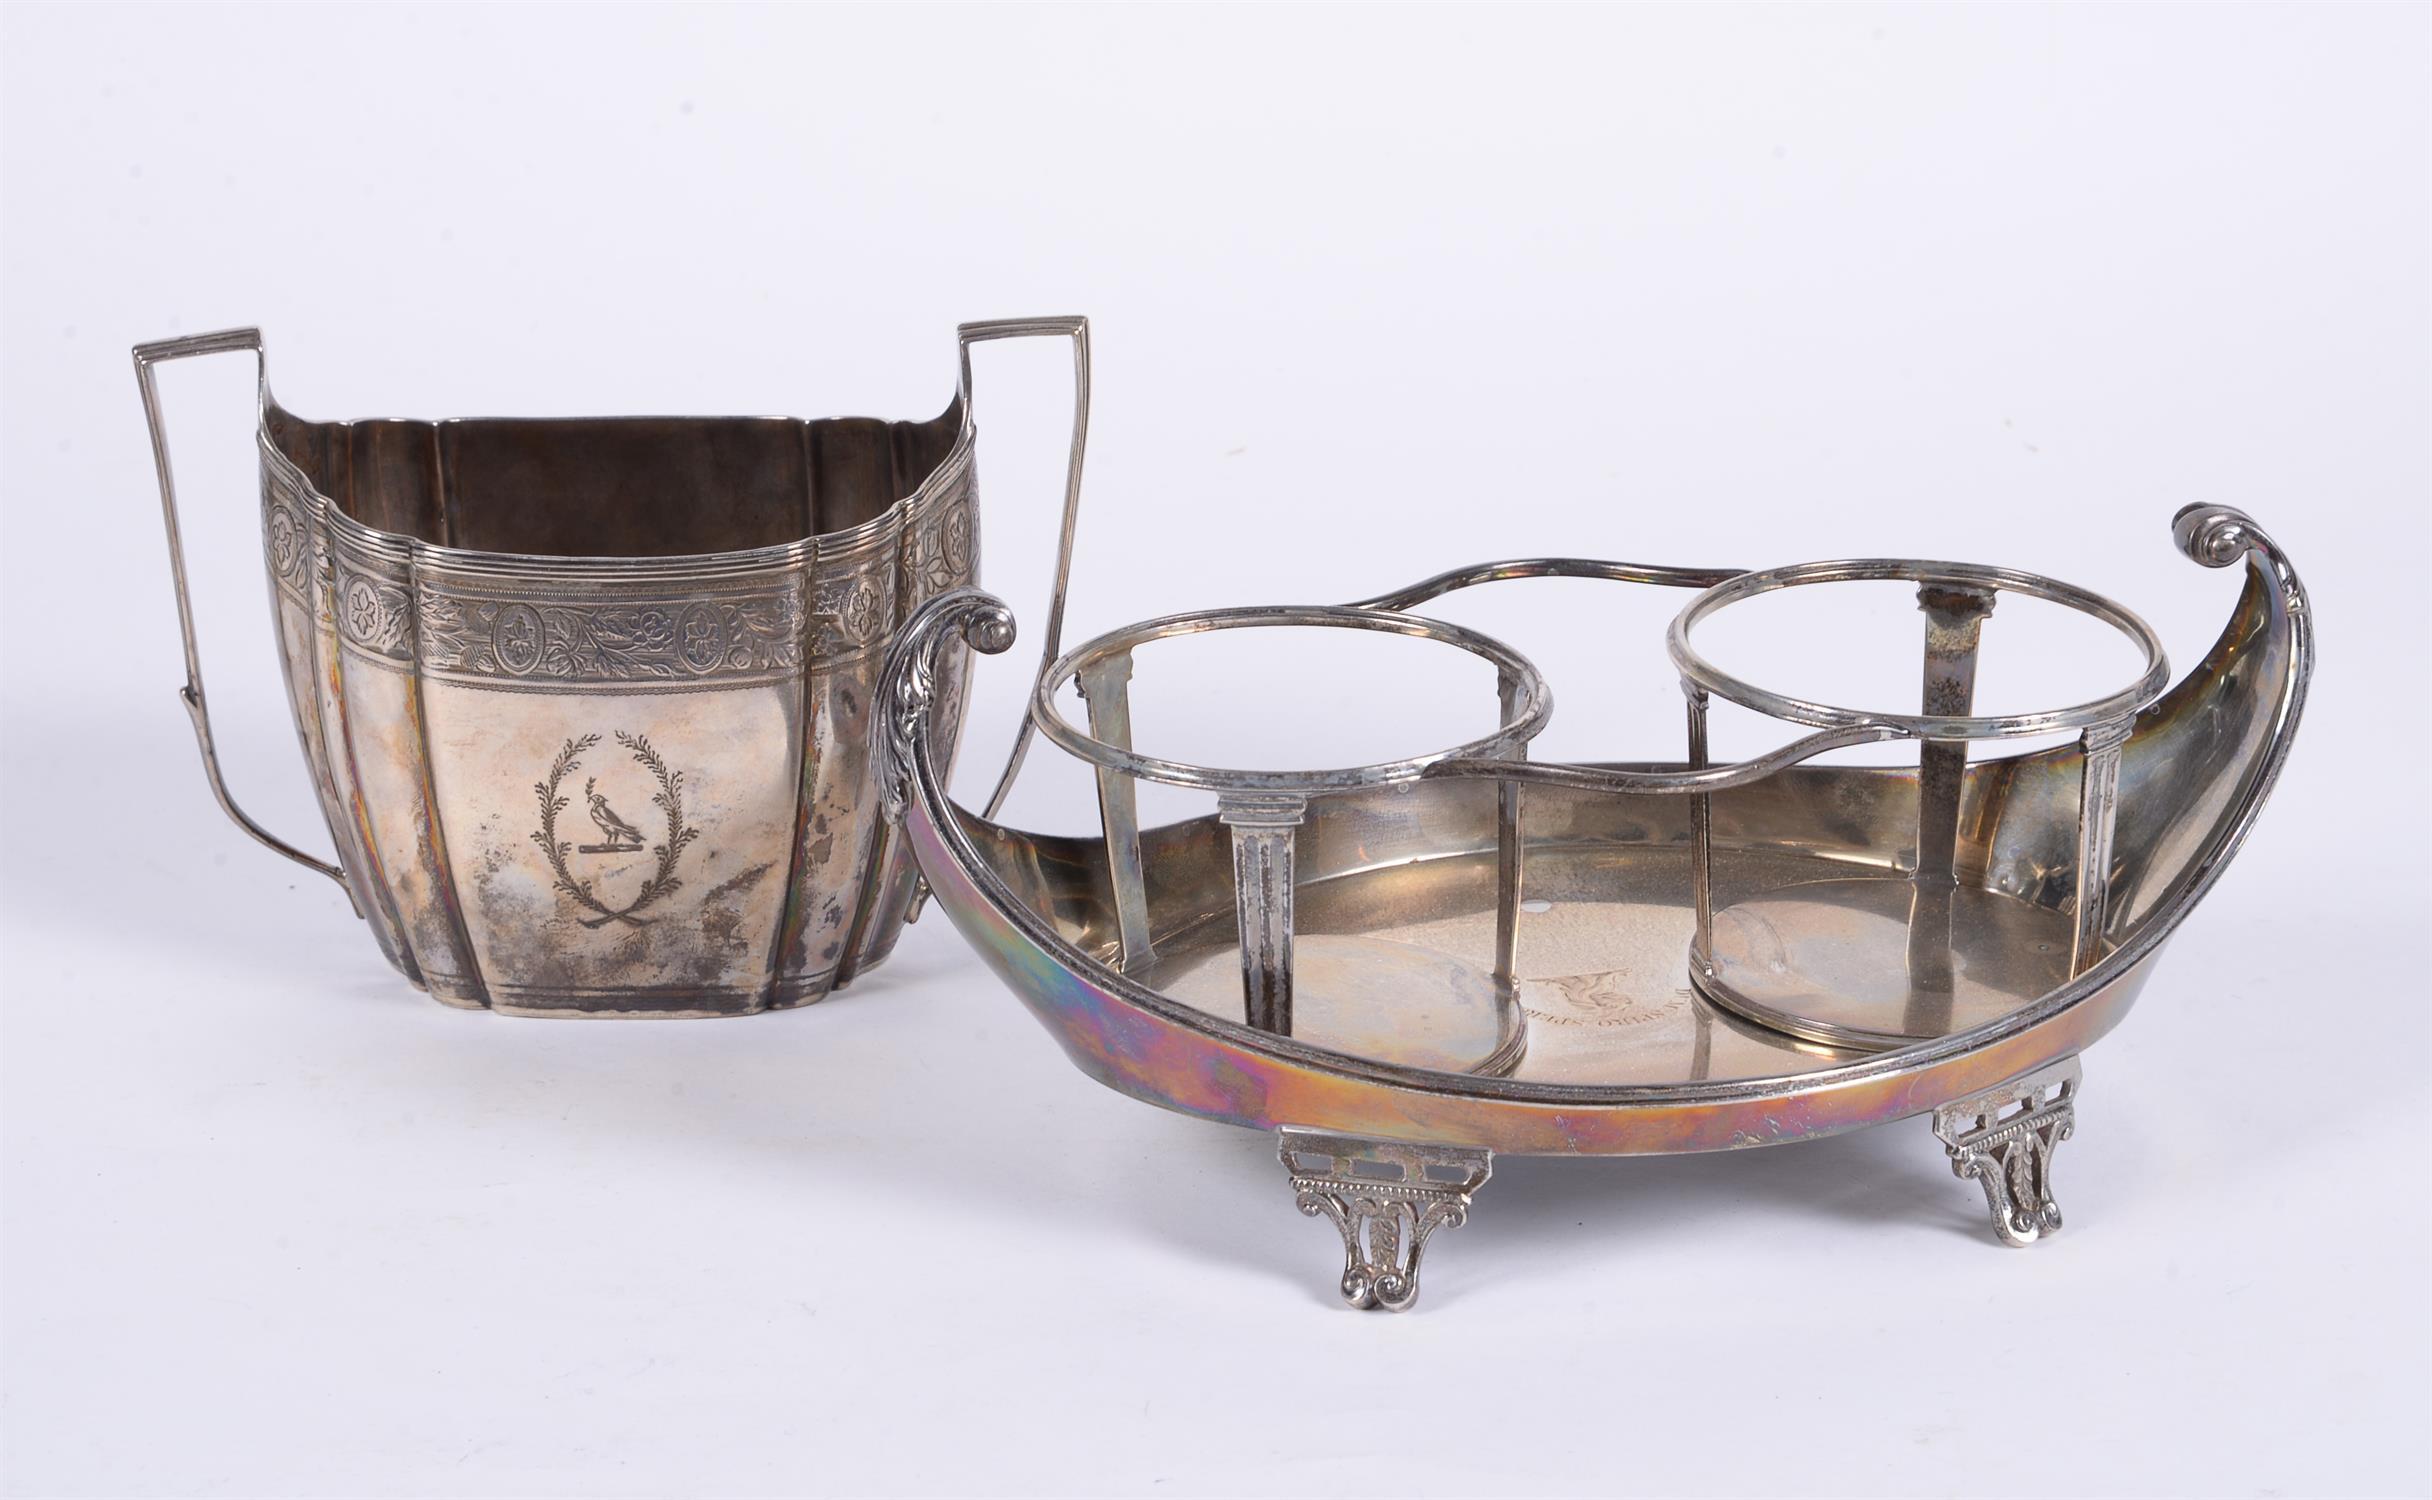 A George III silver twin handled shaped oval sugar basin by Thomas Wallis II